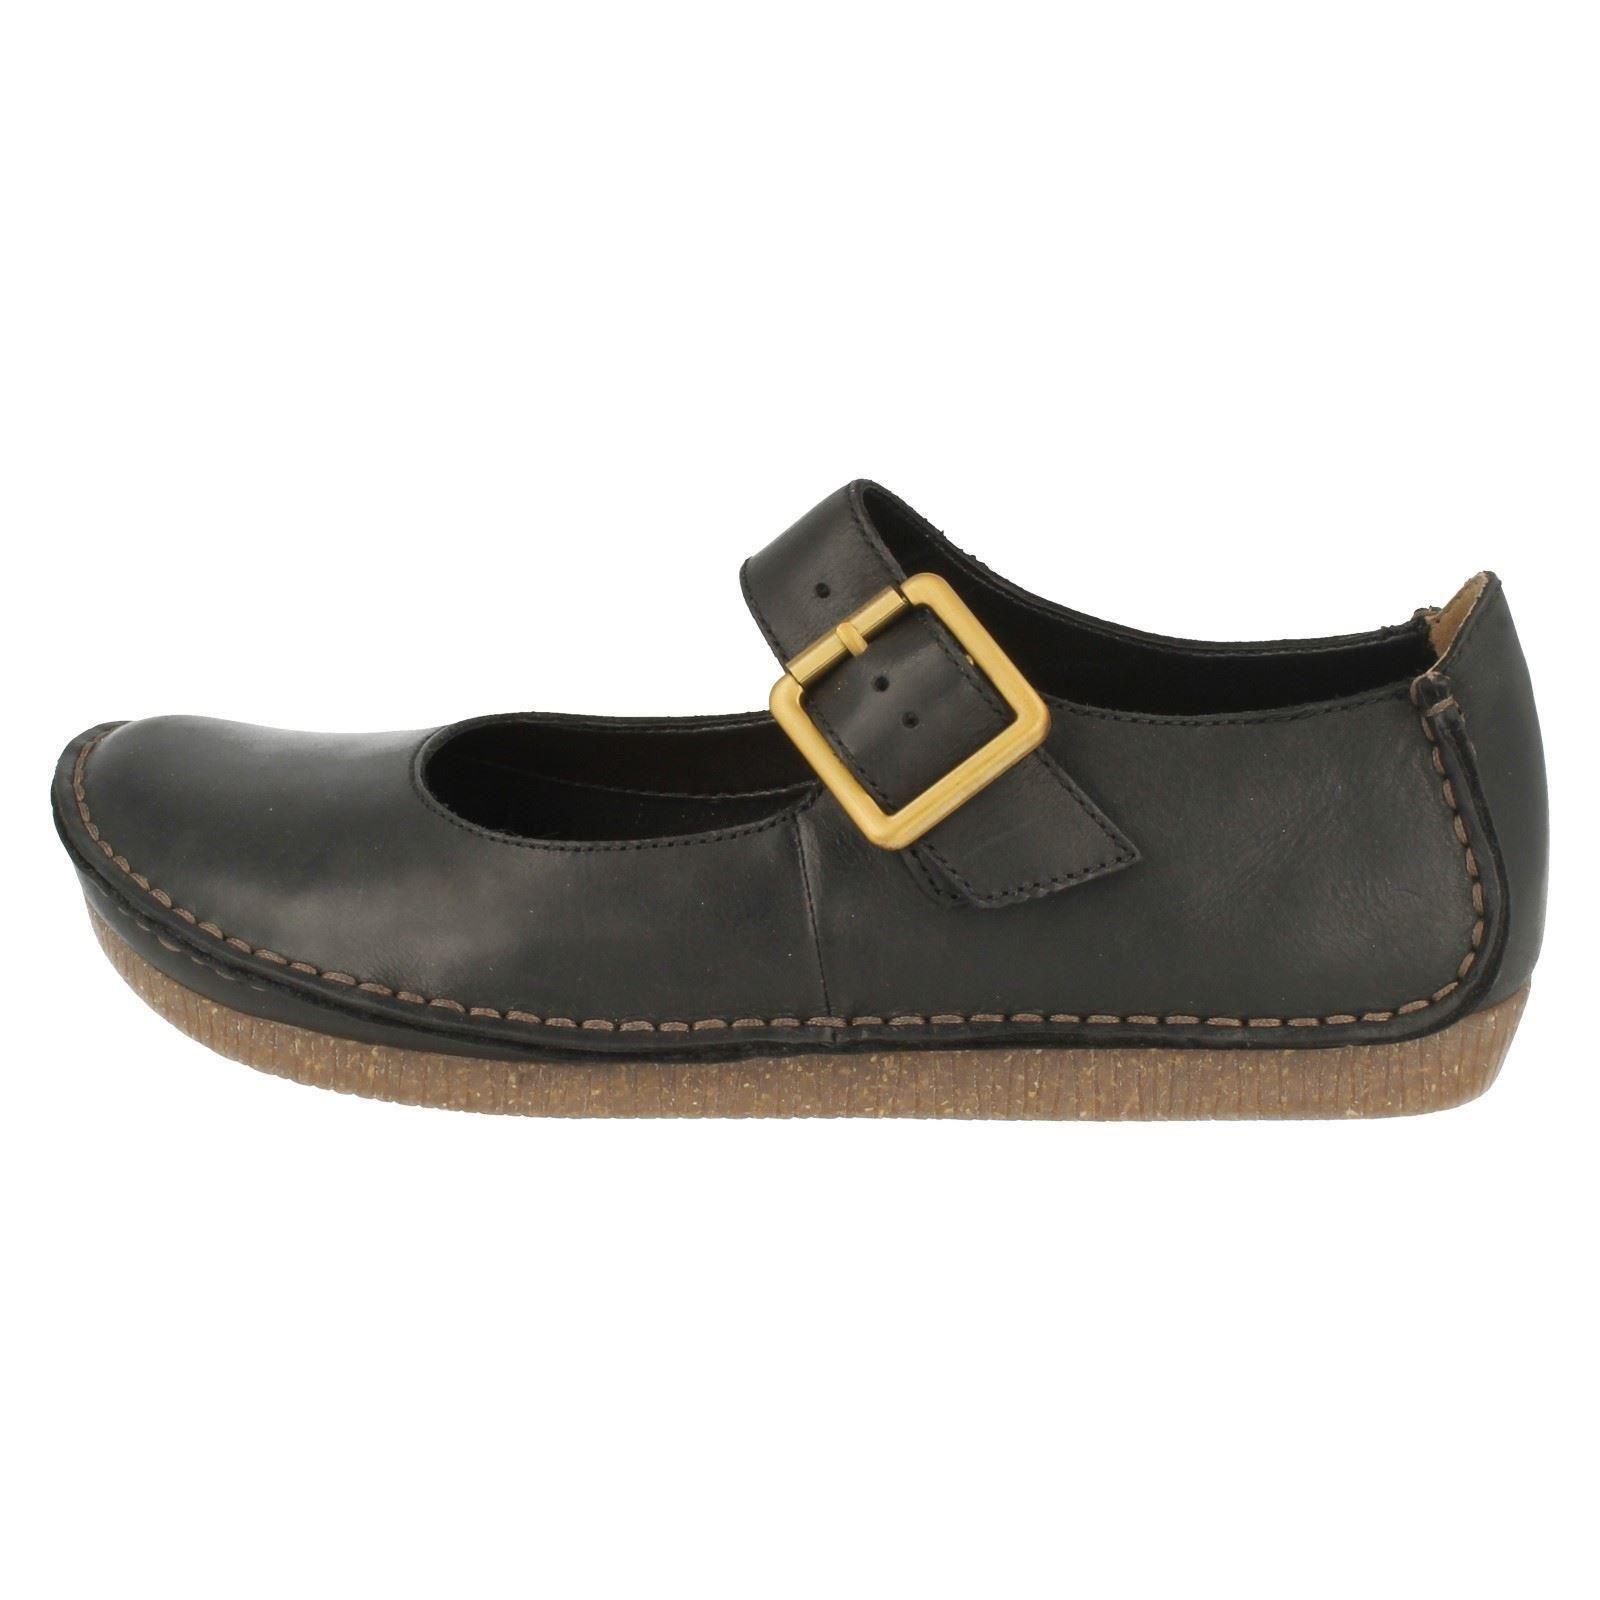 Janey June Shoes Clarks